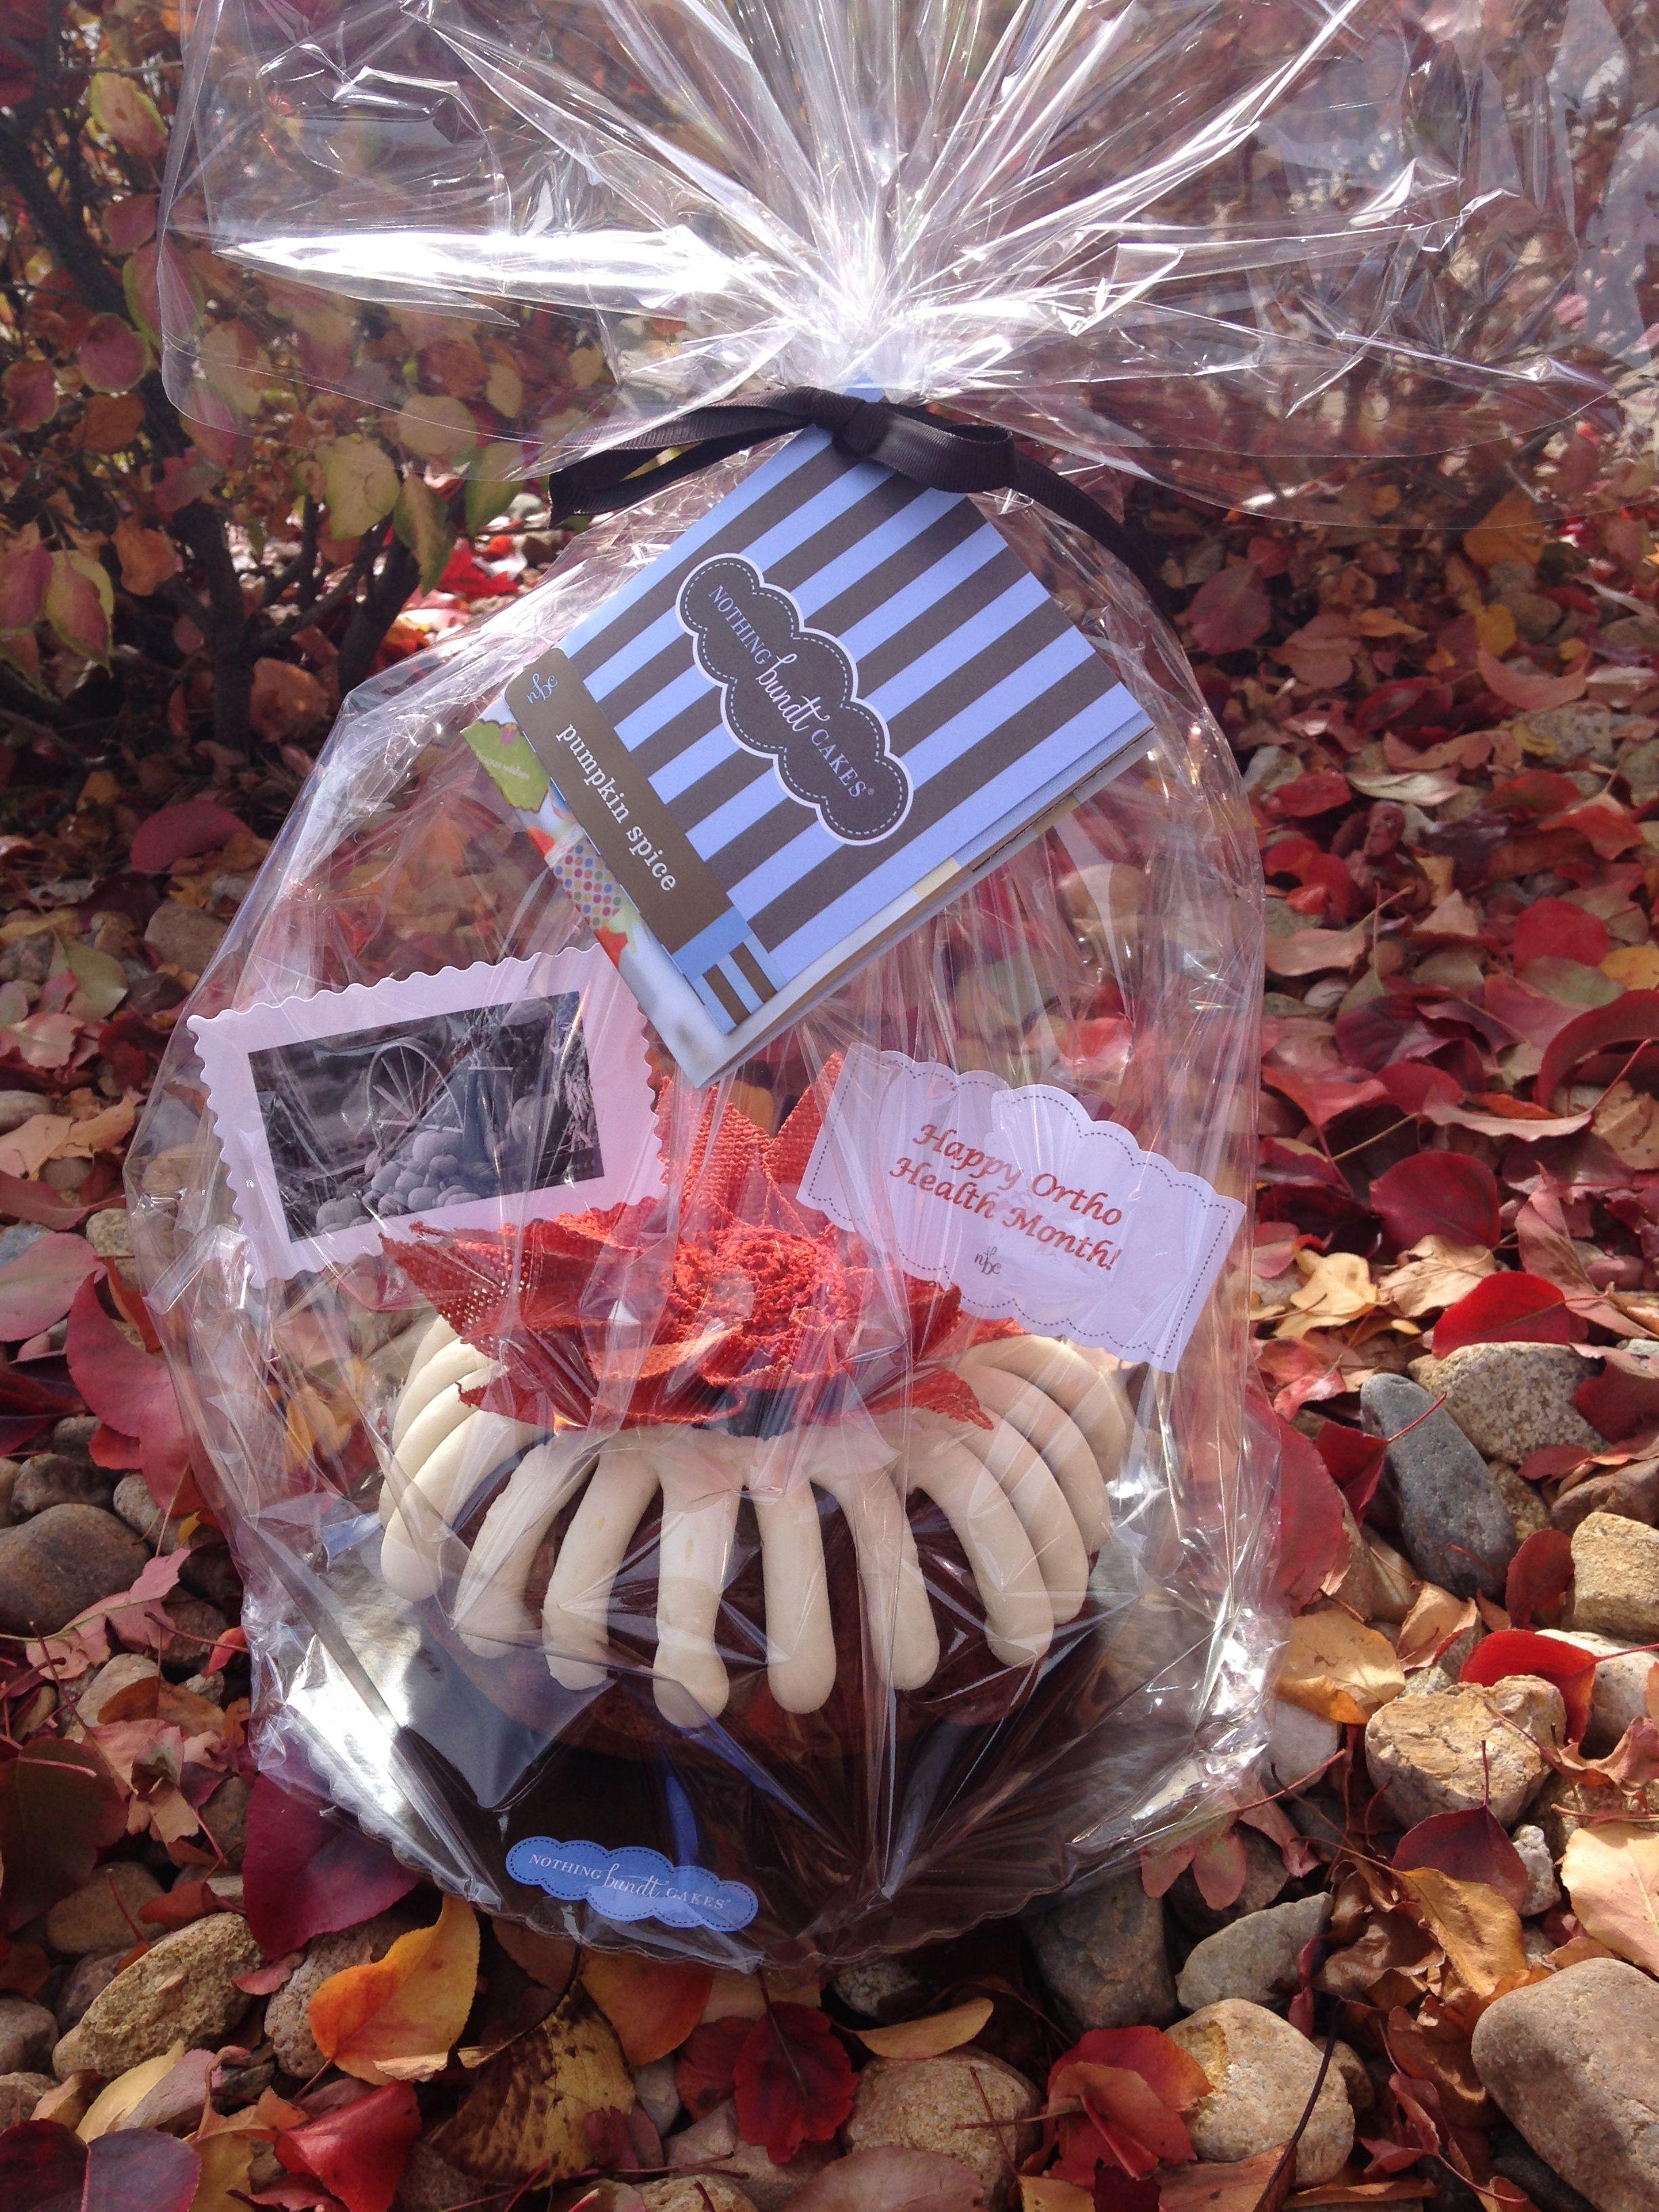 November 2014! Harvest design cake - NBC Westminster, CO (303)248-7224